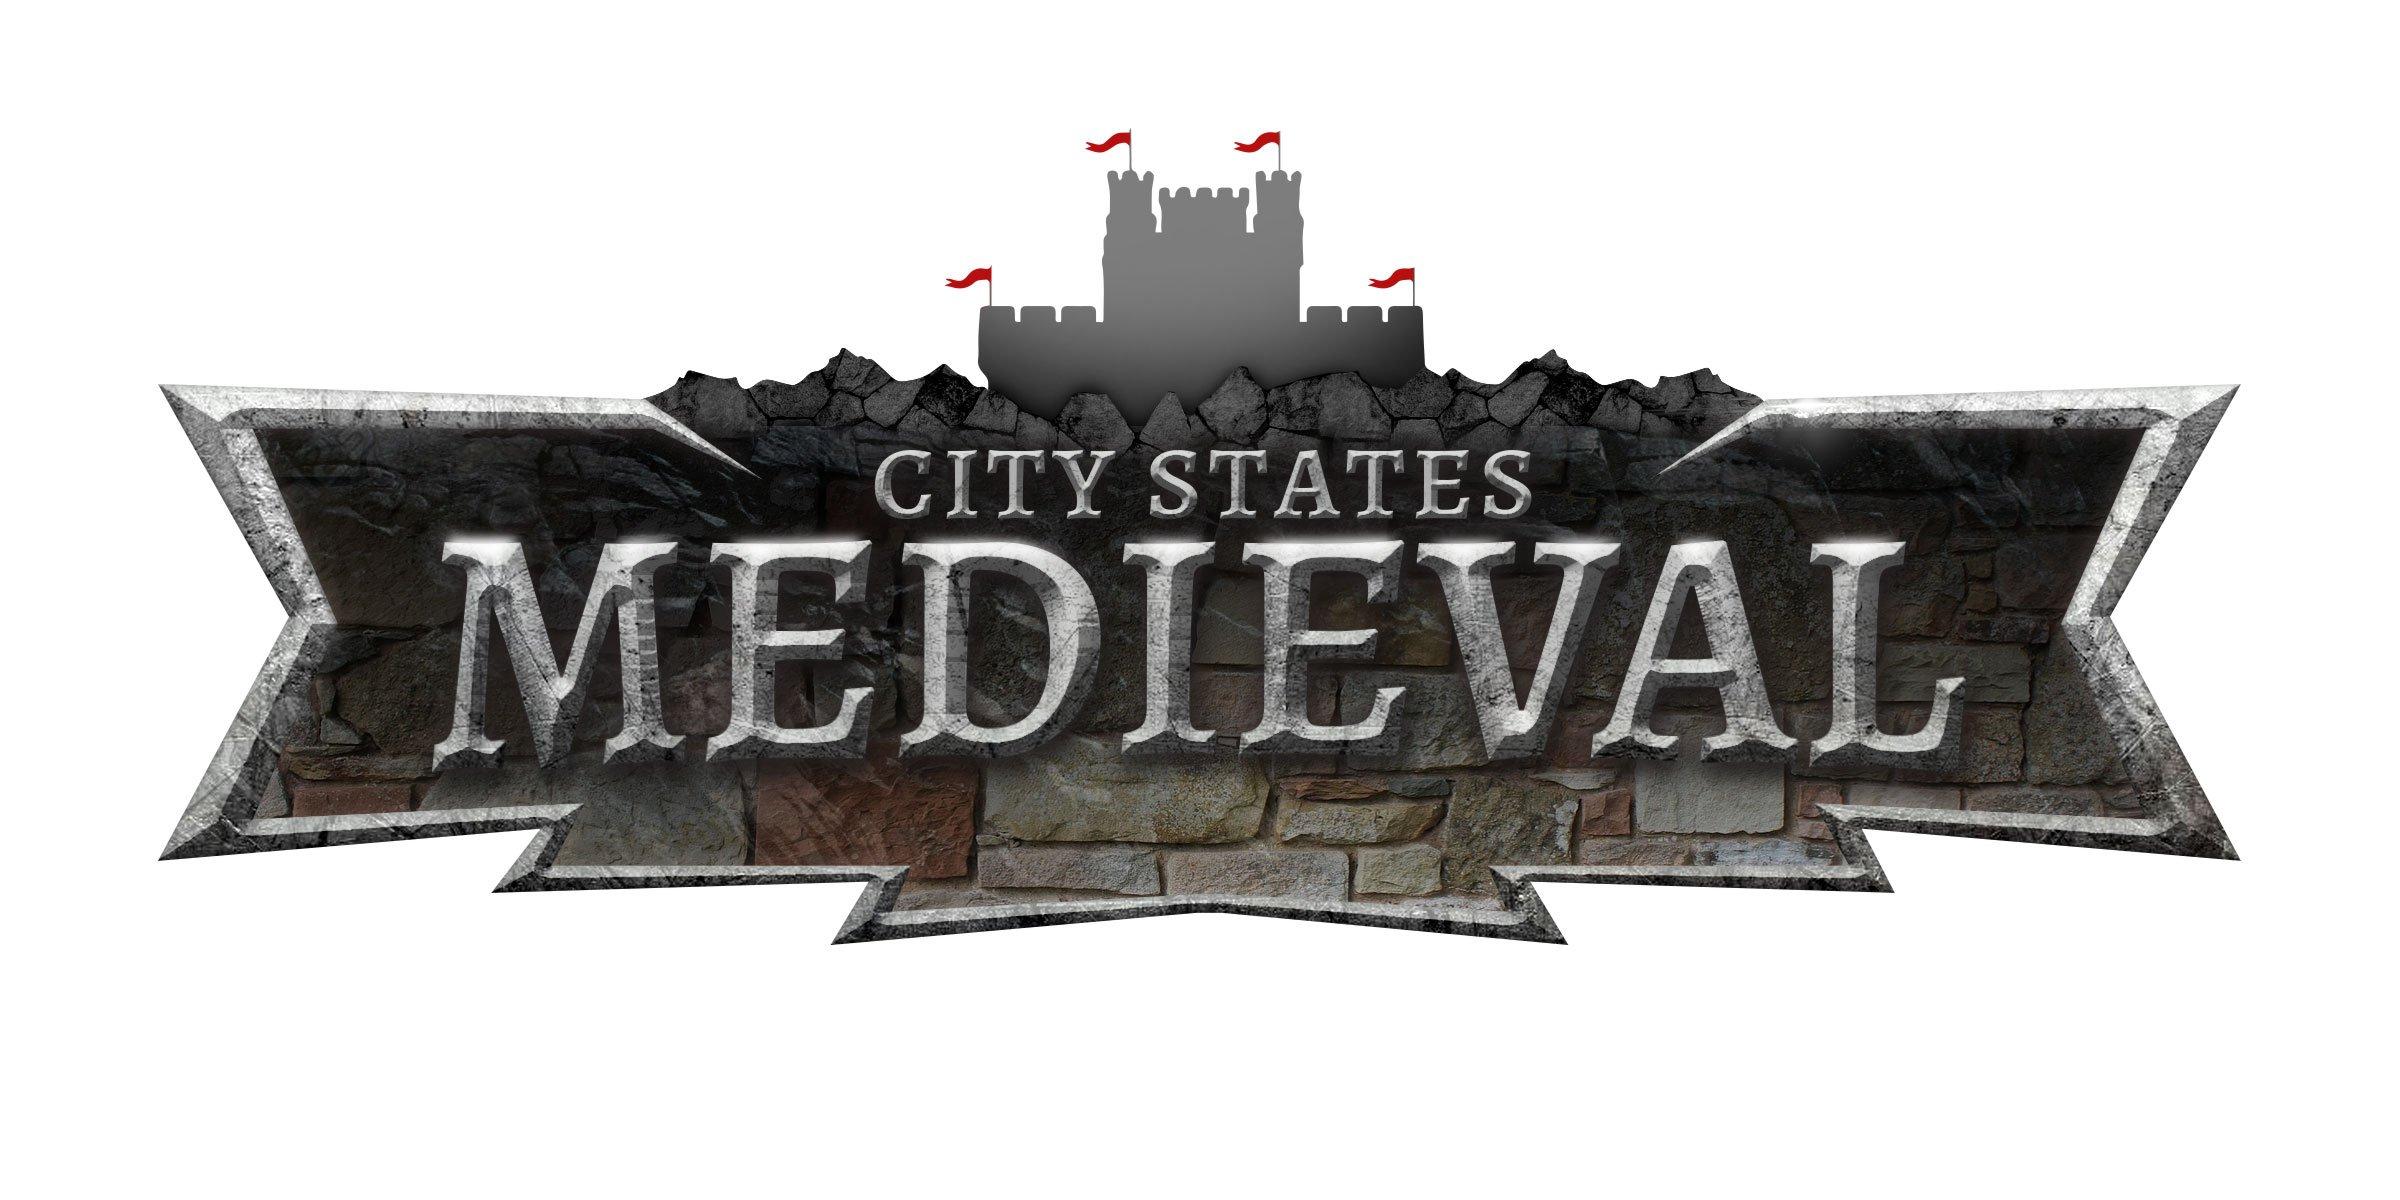 citystates-medieval2.jpg